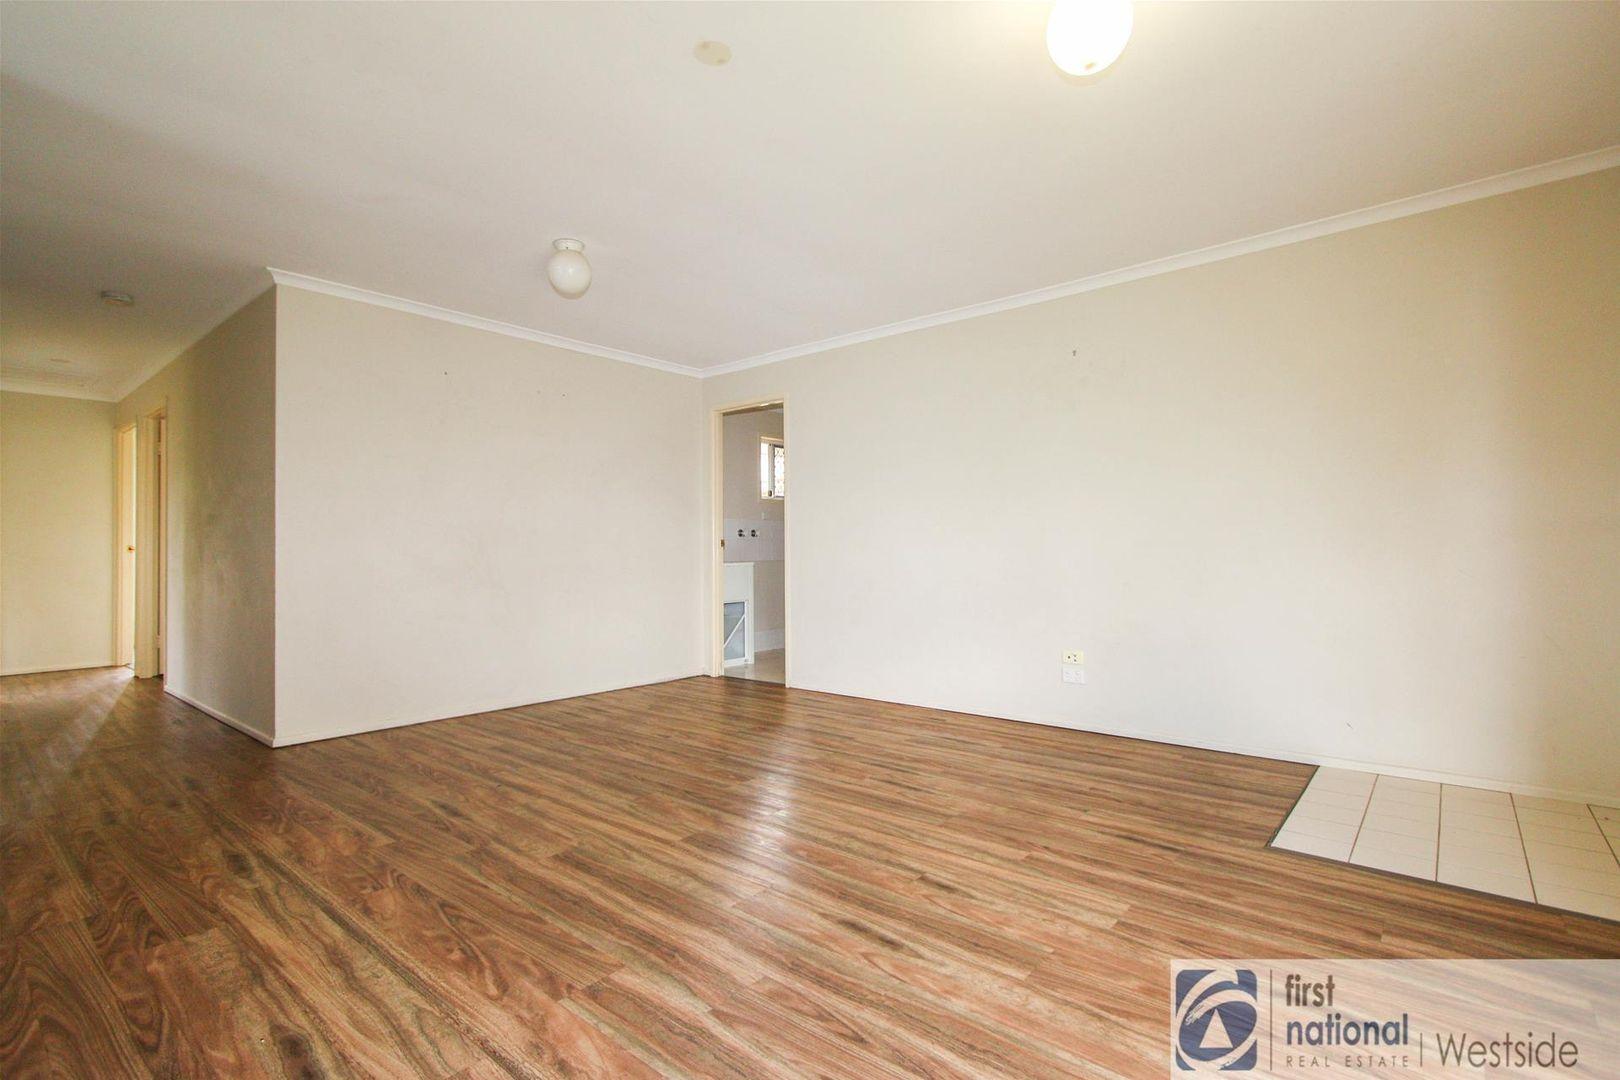 1/12 Mooney Close, Goodna QLD 4300, Image 1